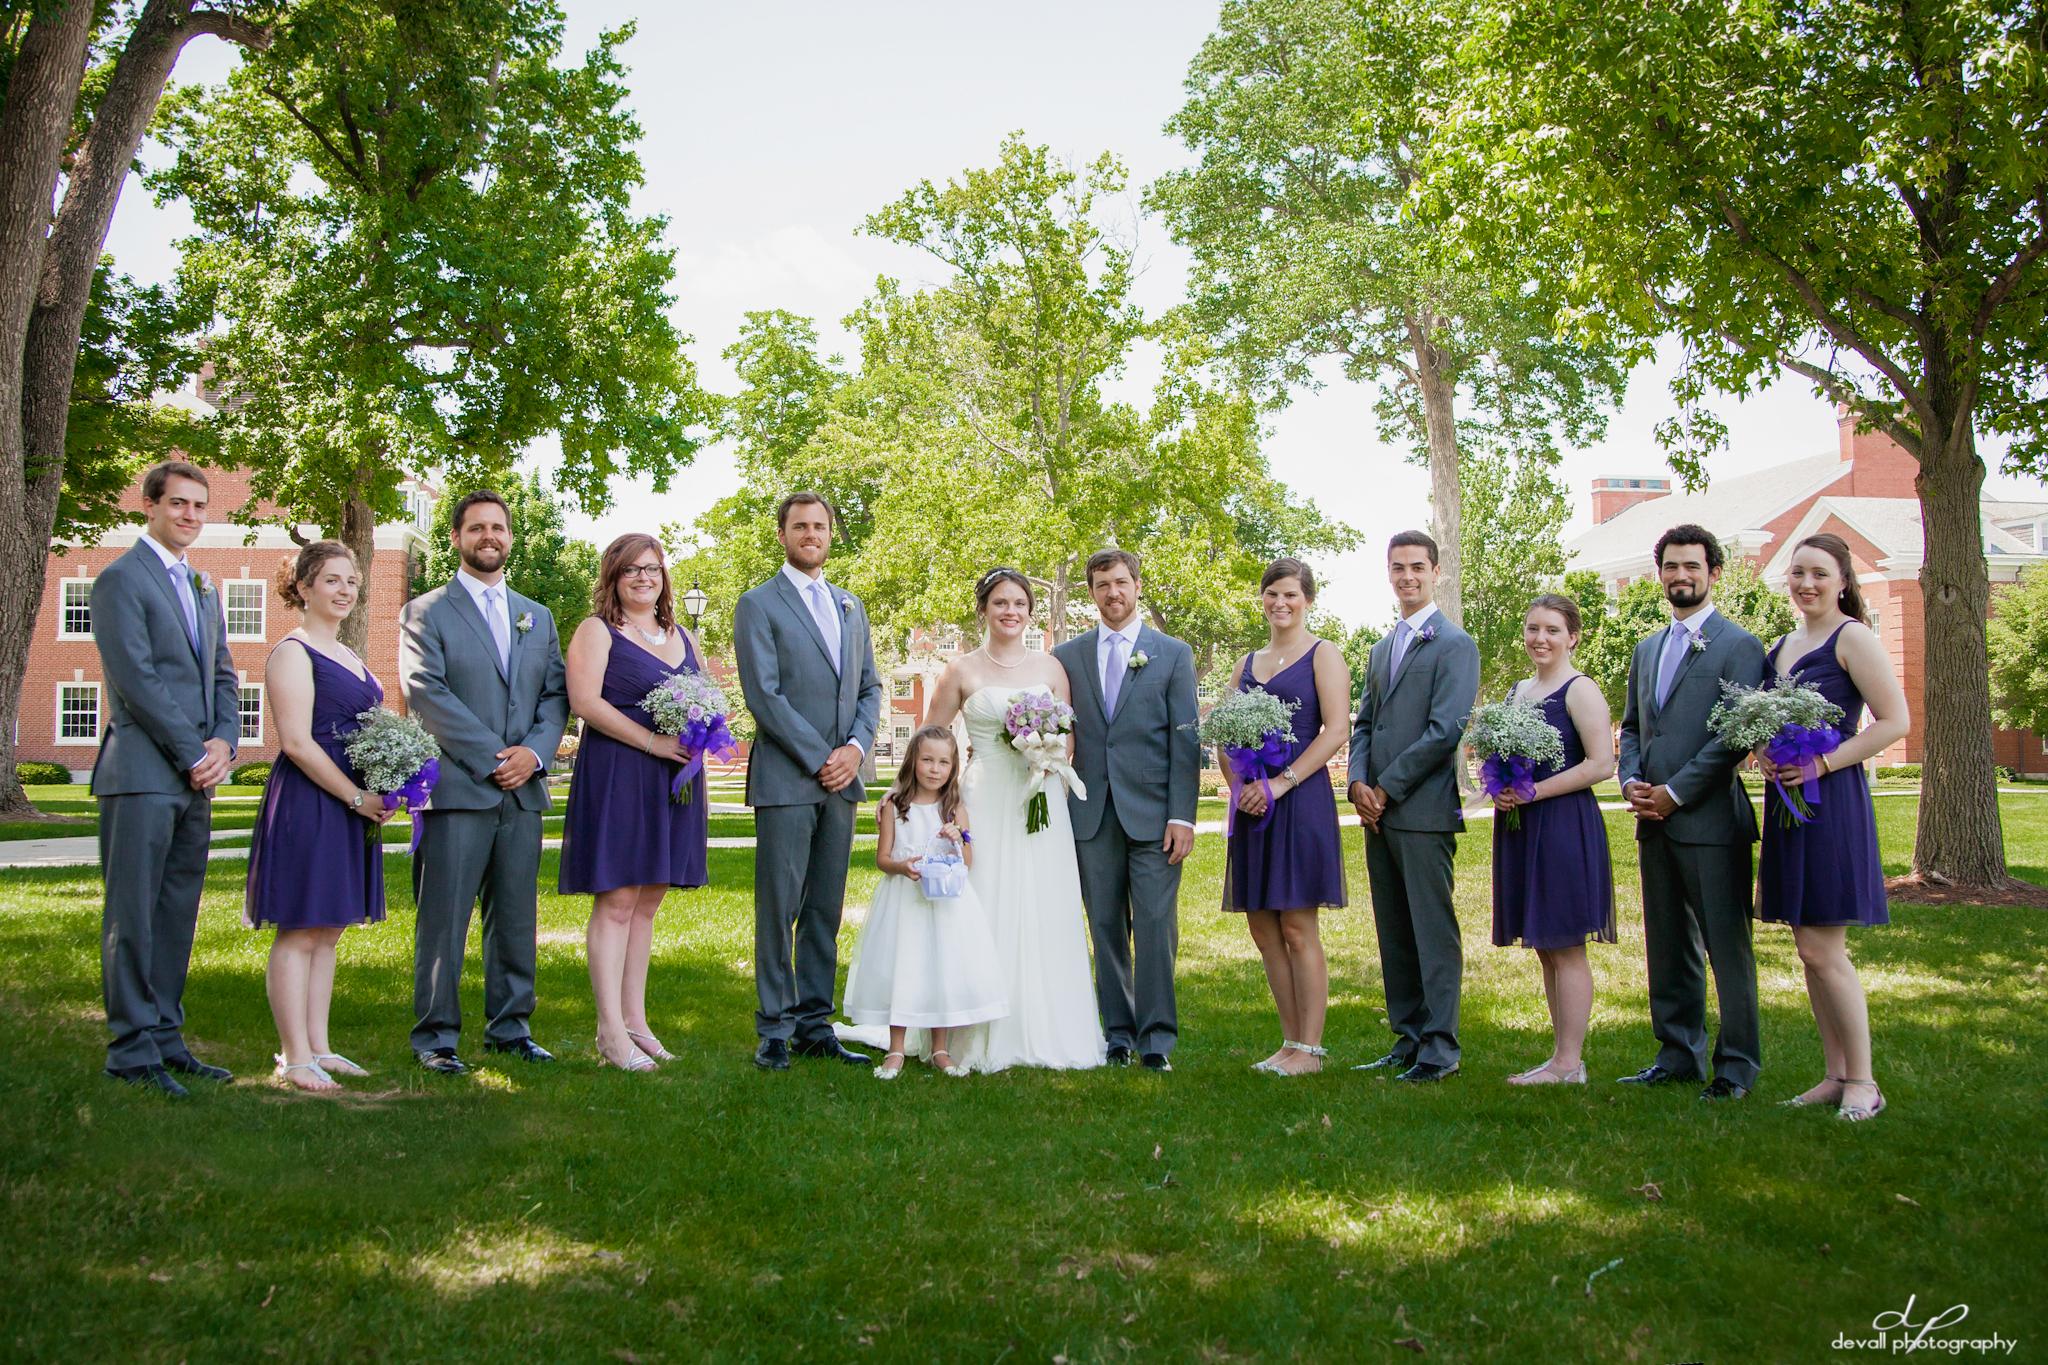 wedding party alternating.jpg